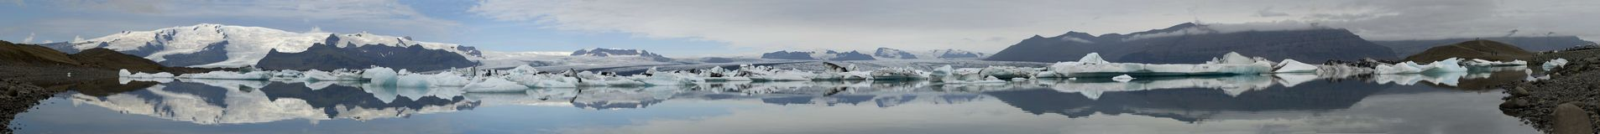 Eisberg in Island lizenzfreies stockfoto